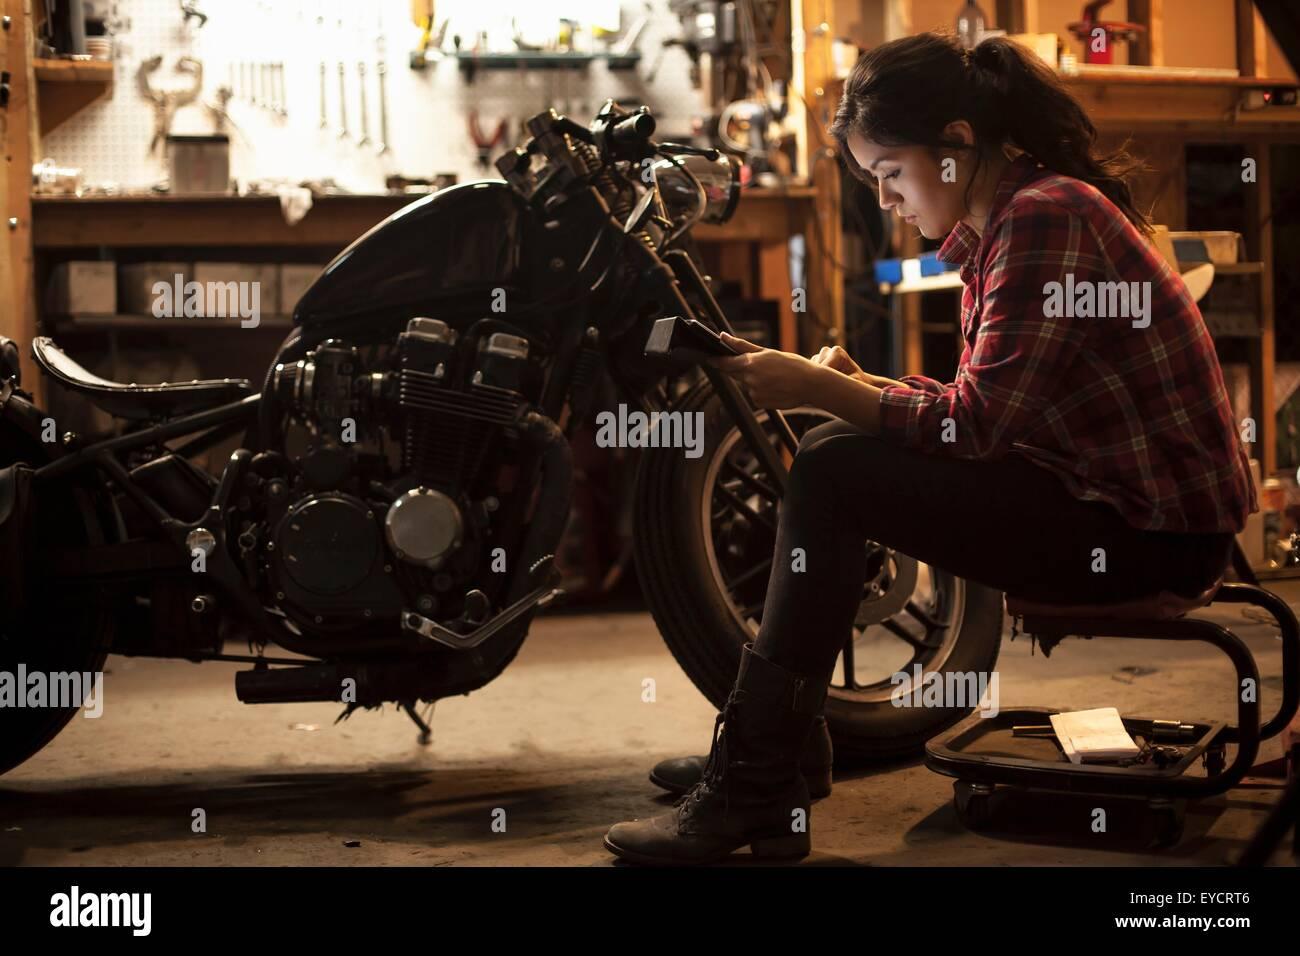 Female mechanic working on motorcycle in workshop - Stock Image